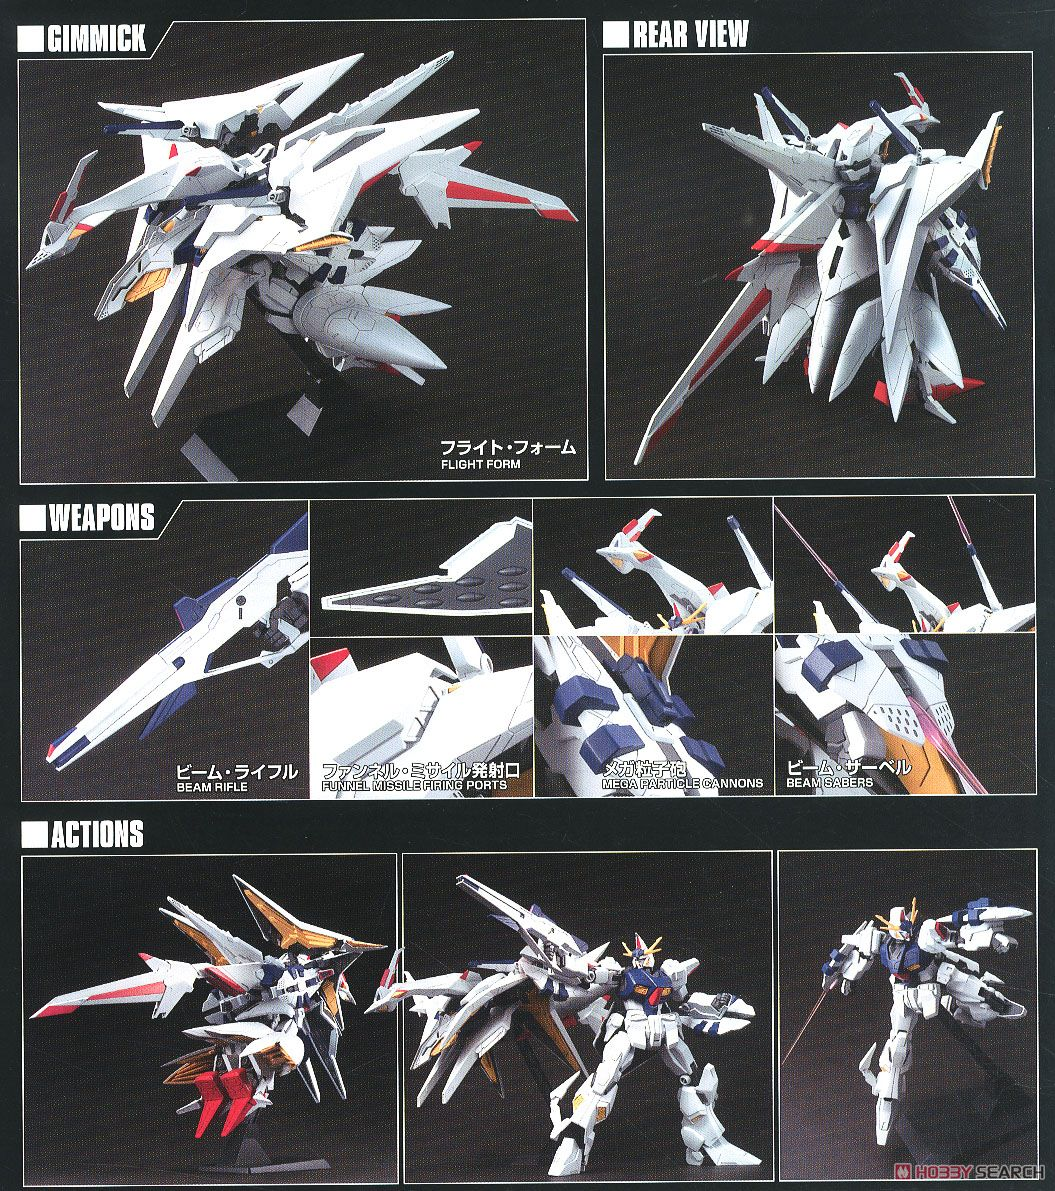 HGUC 1/144『ペーネロペー』機動戦士ガンダム 閃光のハサウェイ プラモデル-028